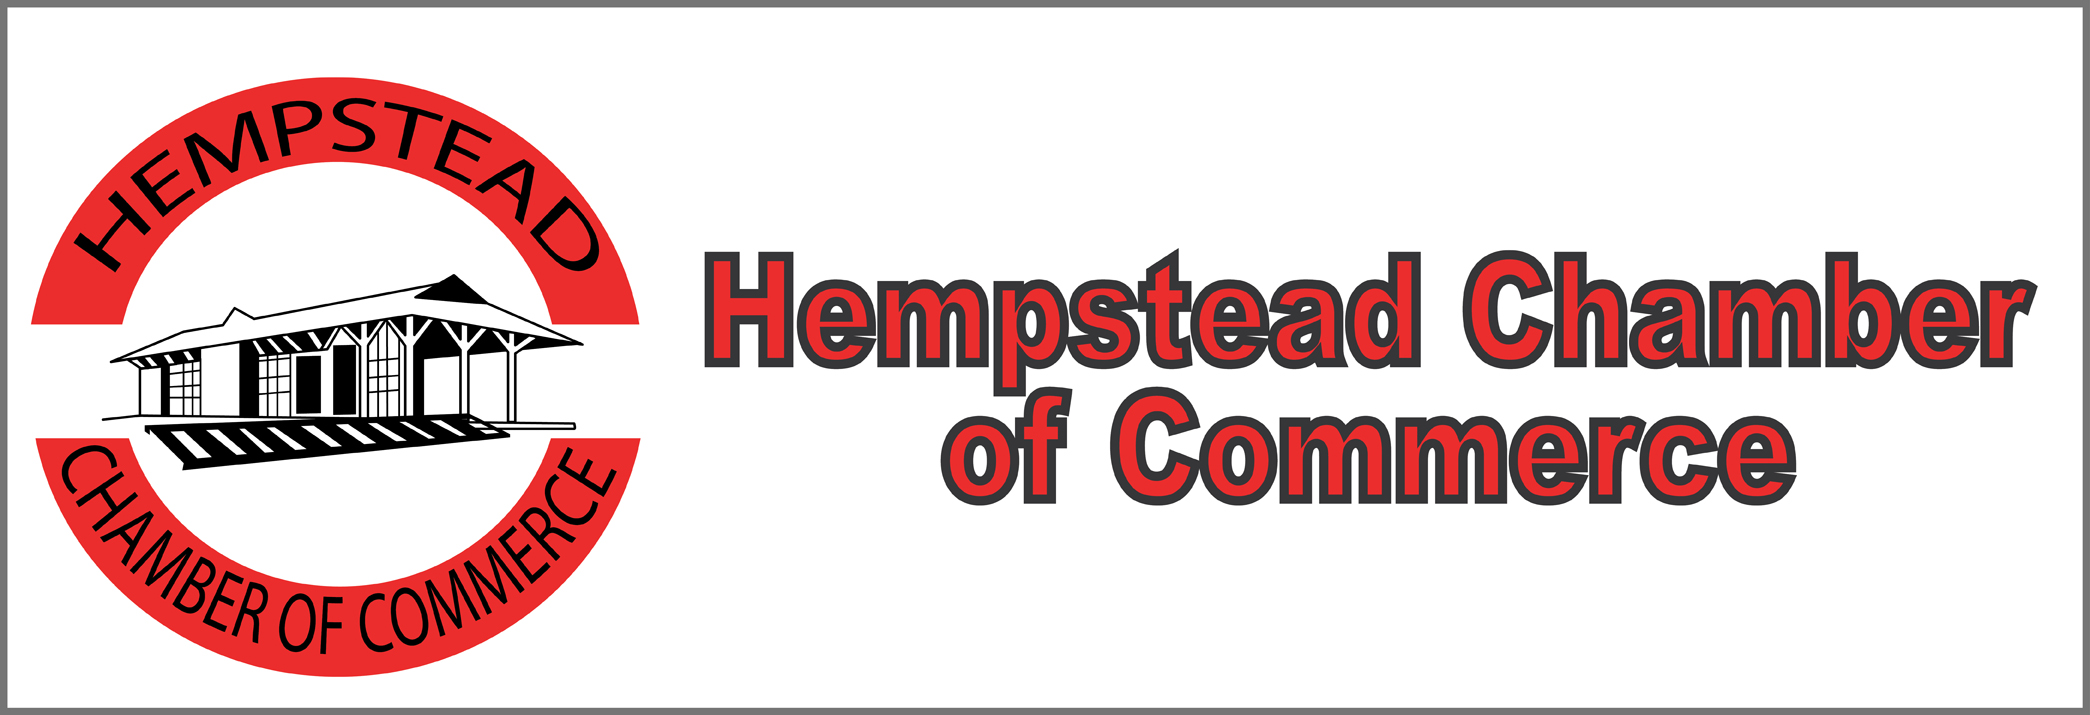 Hempstead chamber-v2-WEB